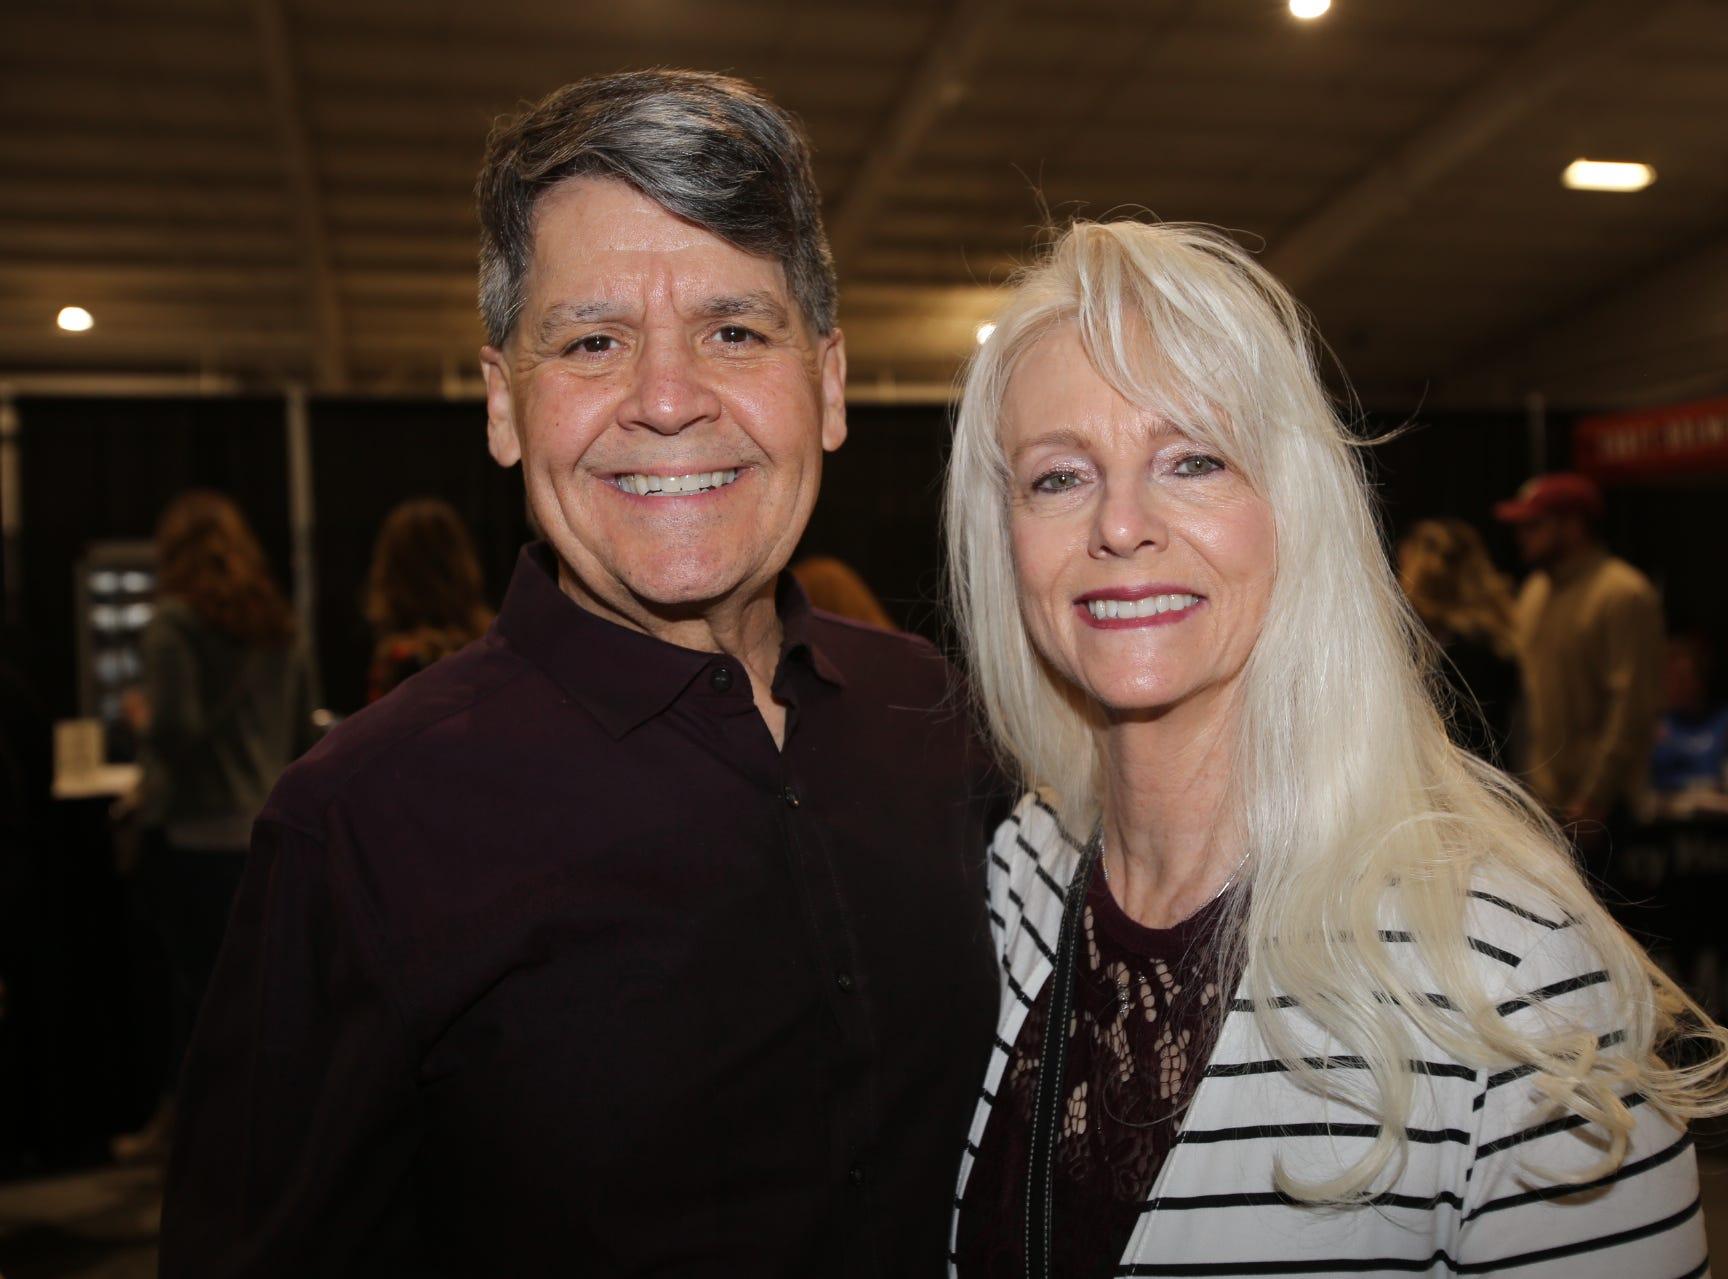 Chuck Ball and Denise Allsop